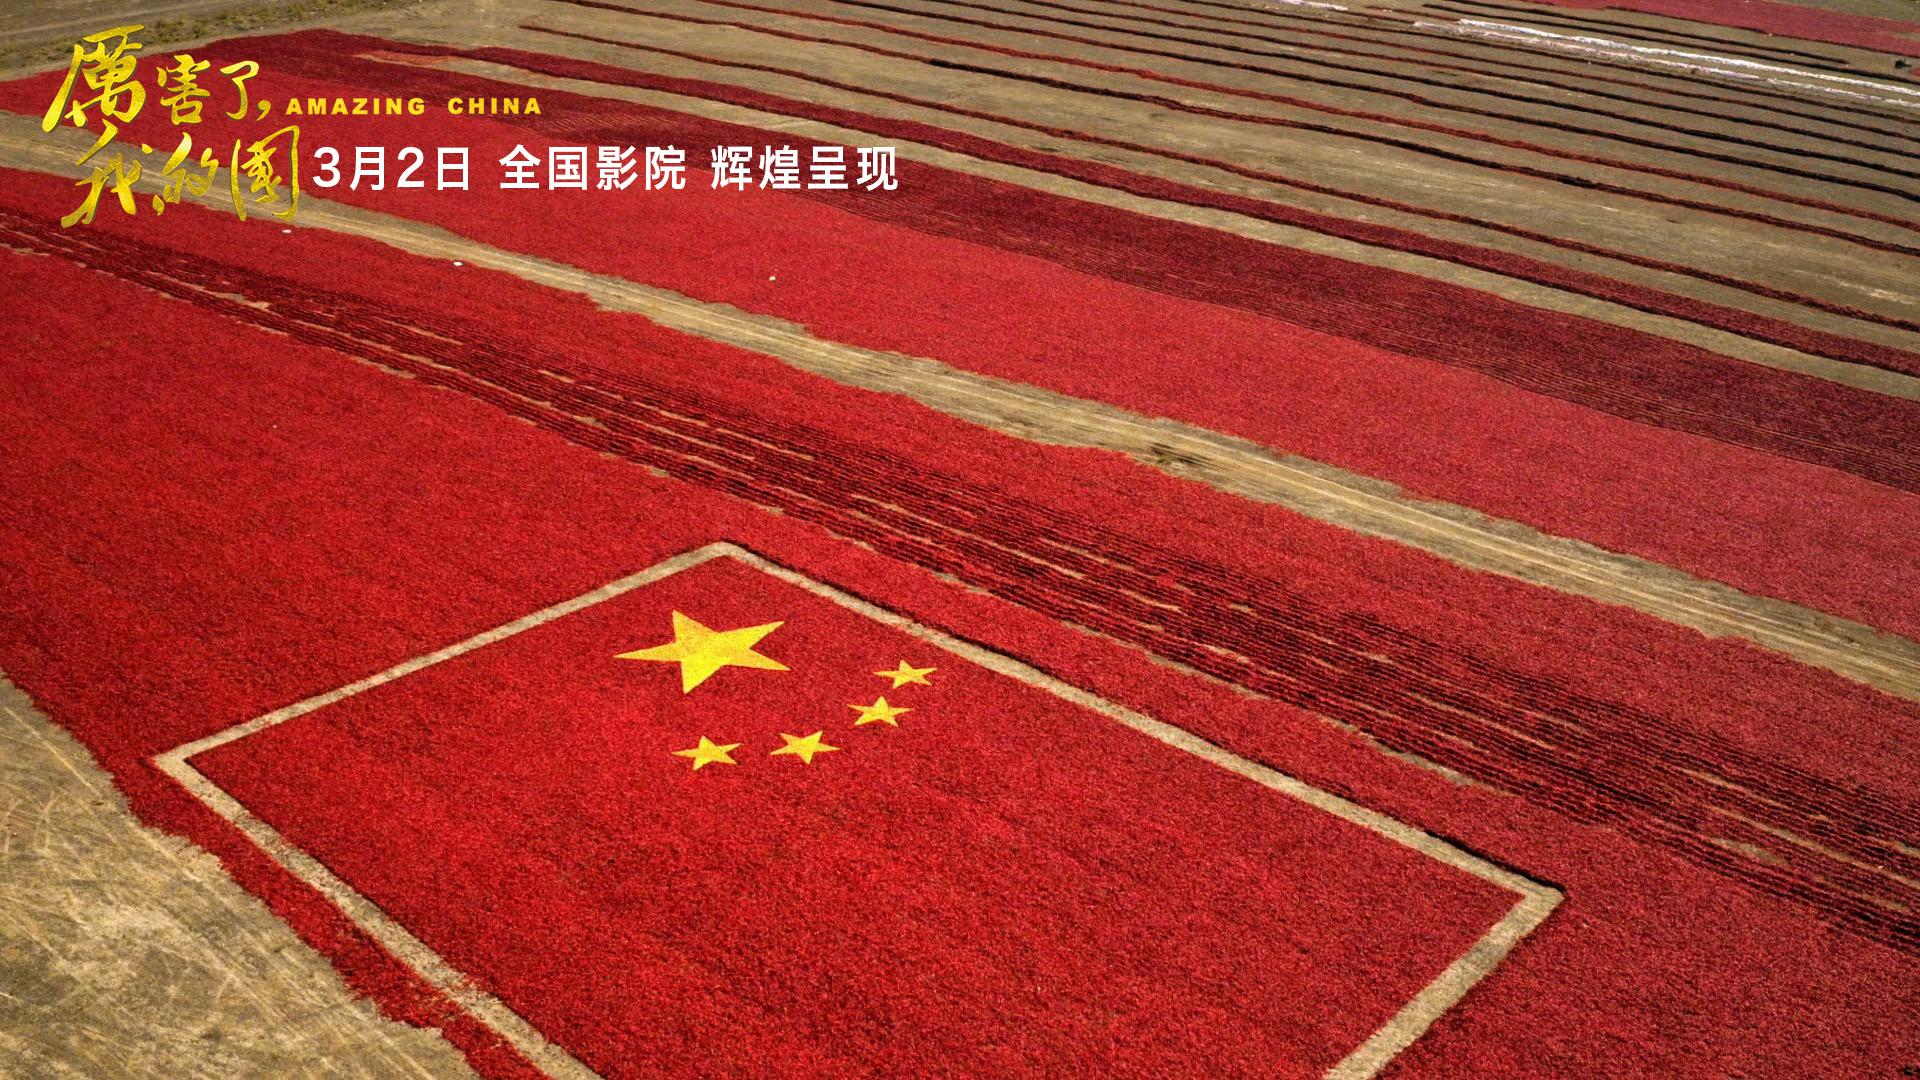 Amazing China poster